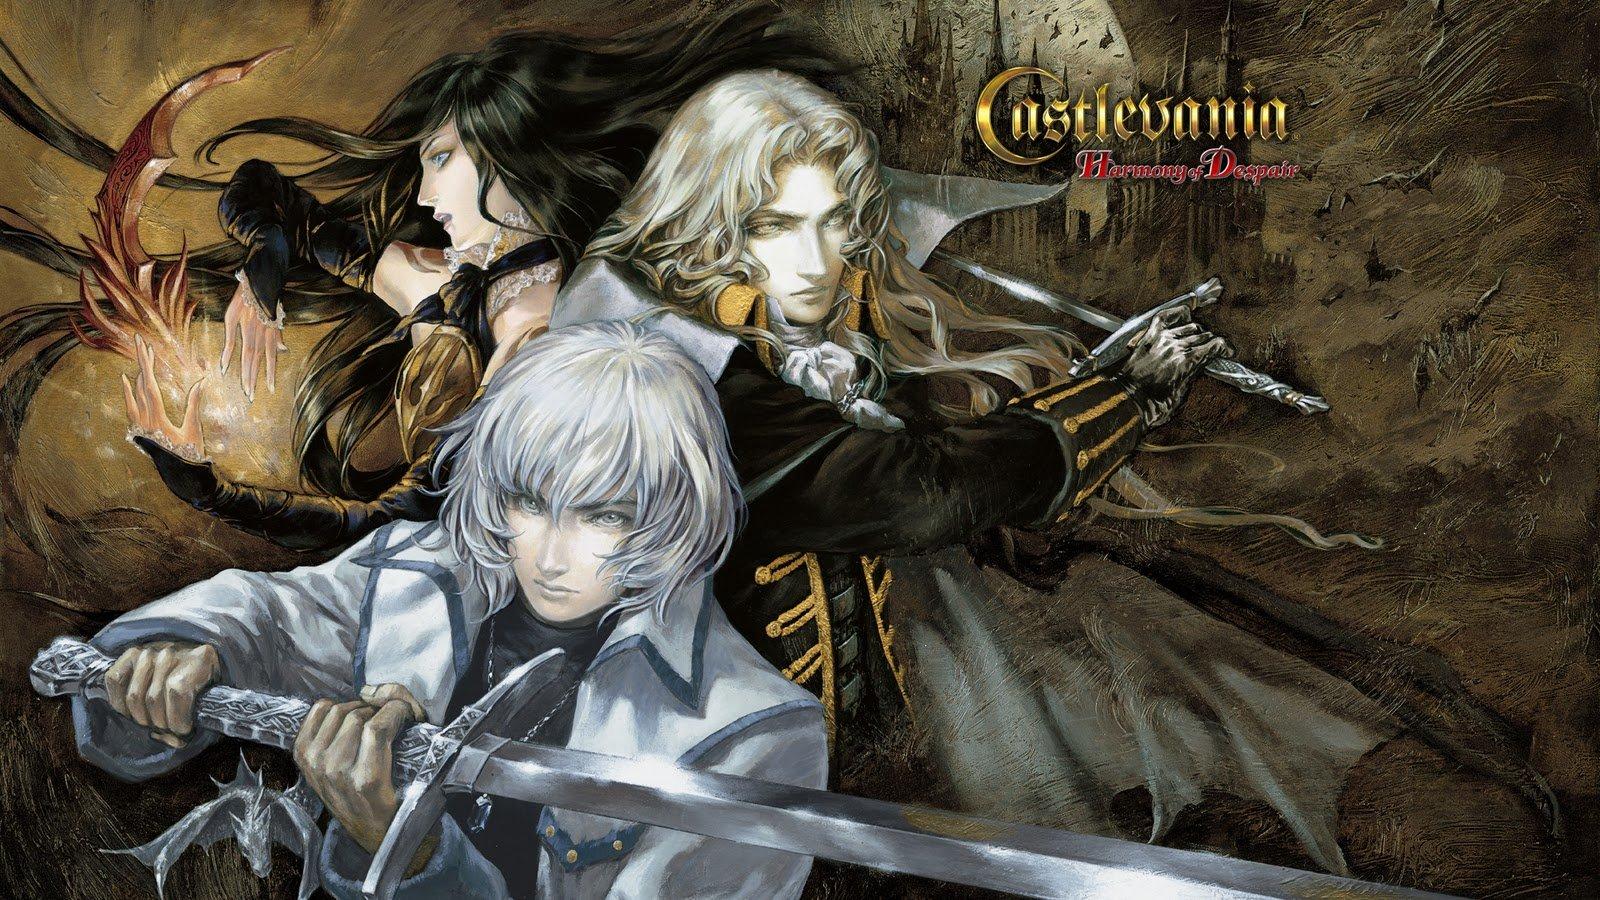 Castlevania: Harmony of Despair Review 5